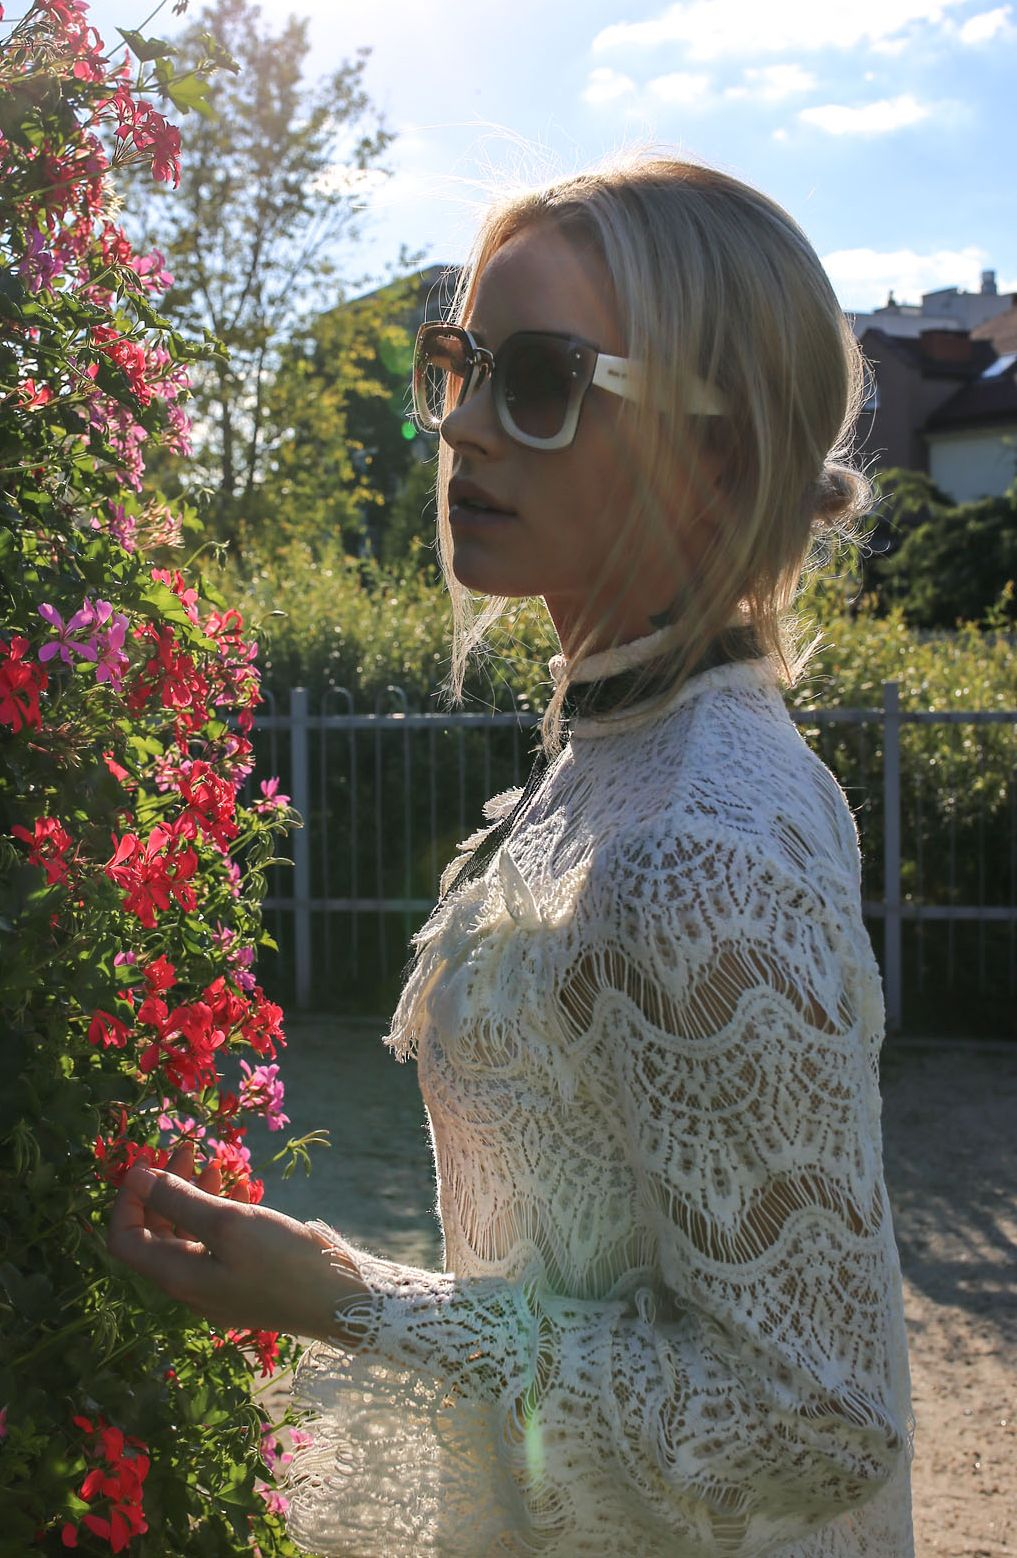 88677598fde Acetate frame of Miumiu. Unique feminine style with bigger lens. Sunglasses  MiuMiu 04RS by fashion blogger  juliett-kuczynska-maffashion  miumiu   sunglasses ...